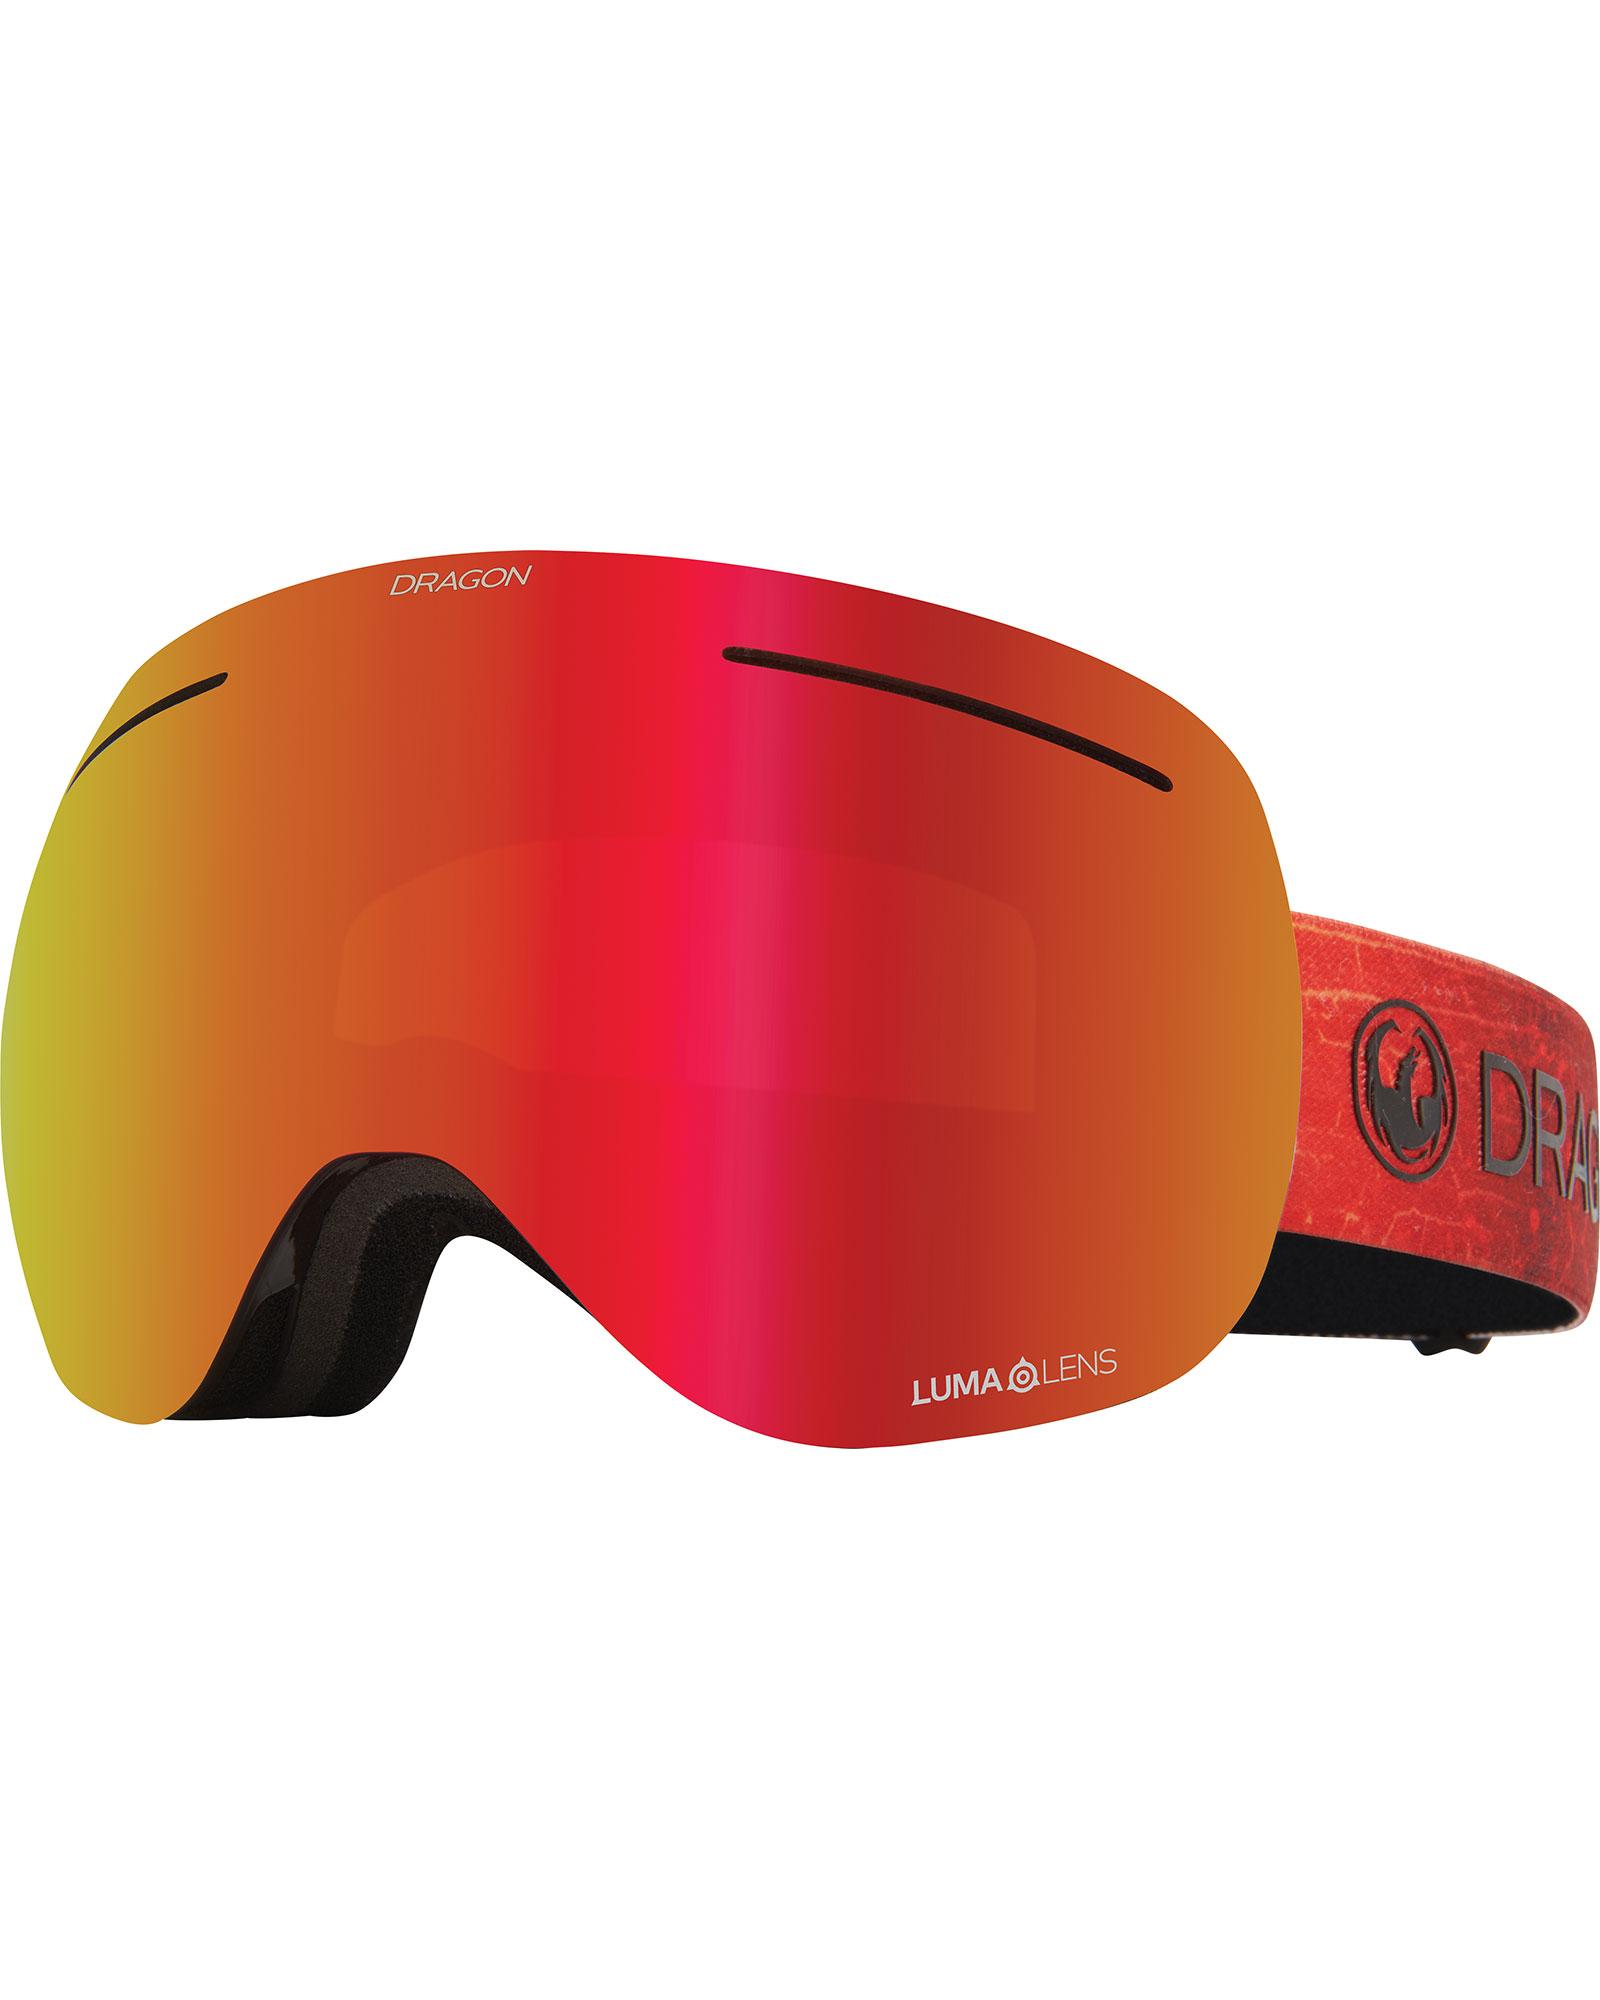 Dragon X1 Inferno / Lumalens Red Ionized + Lumalens Rose Goggles 2020 / 2021 0